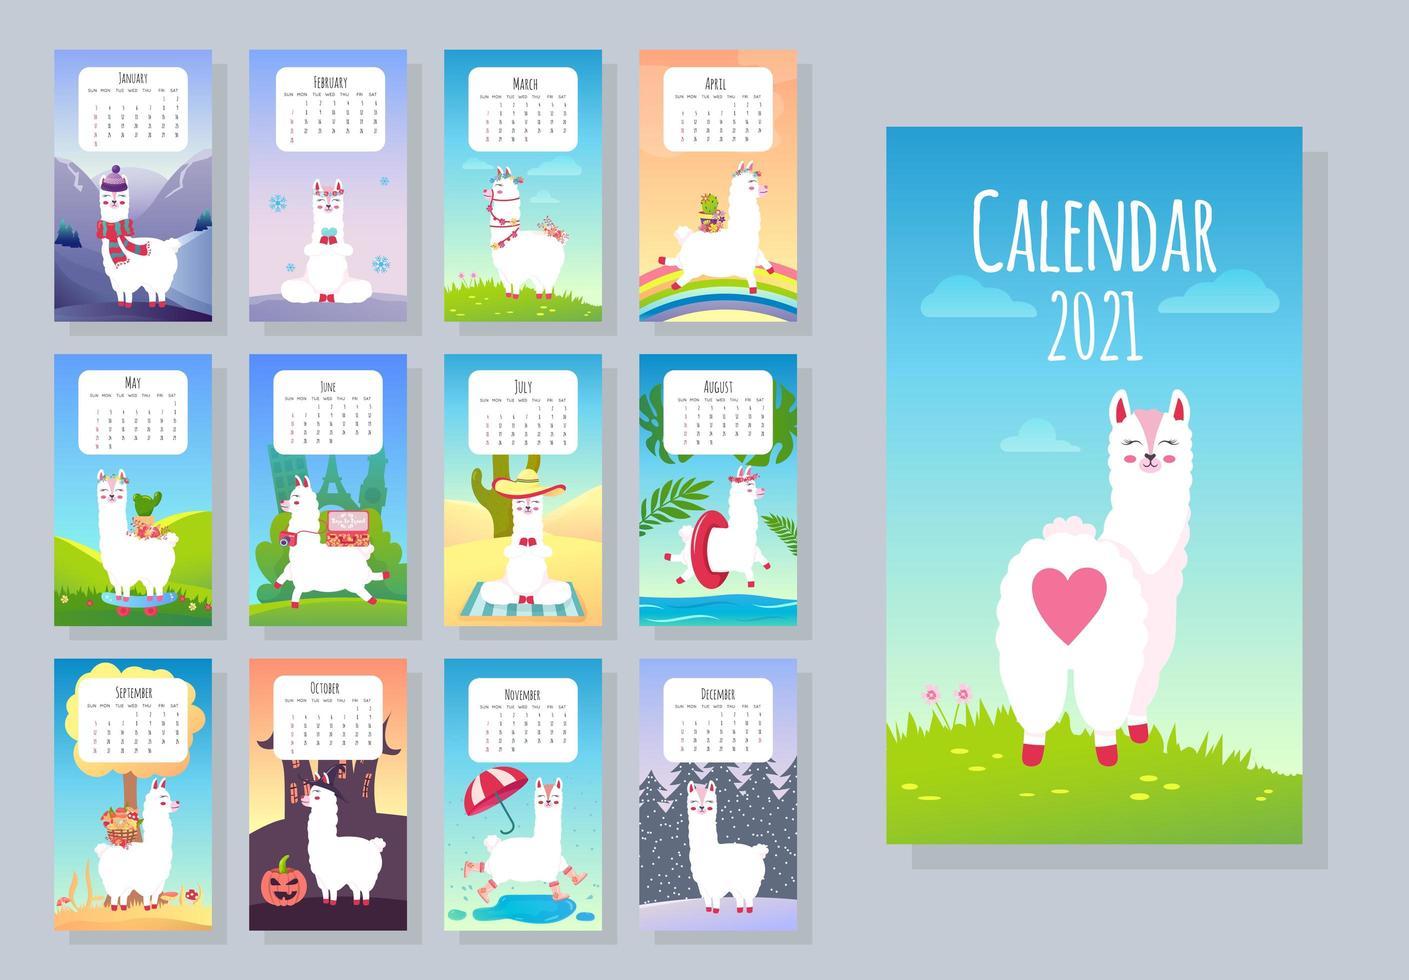 simpatico calendario mensile 2021 con lama, alpaca   Scarica